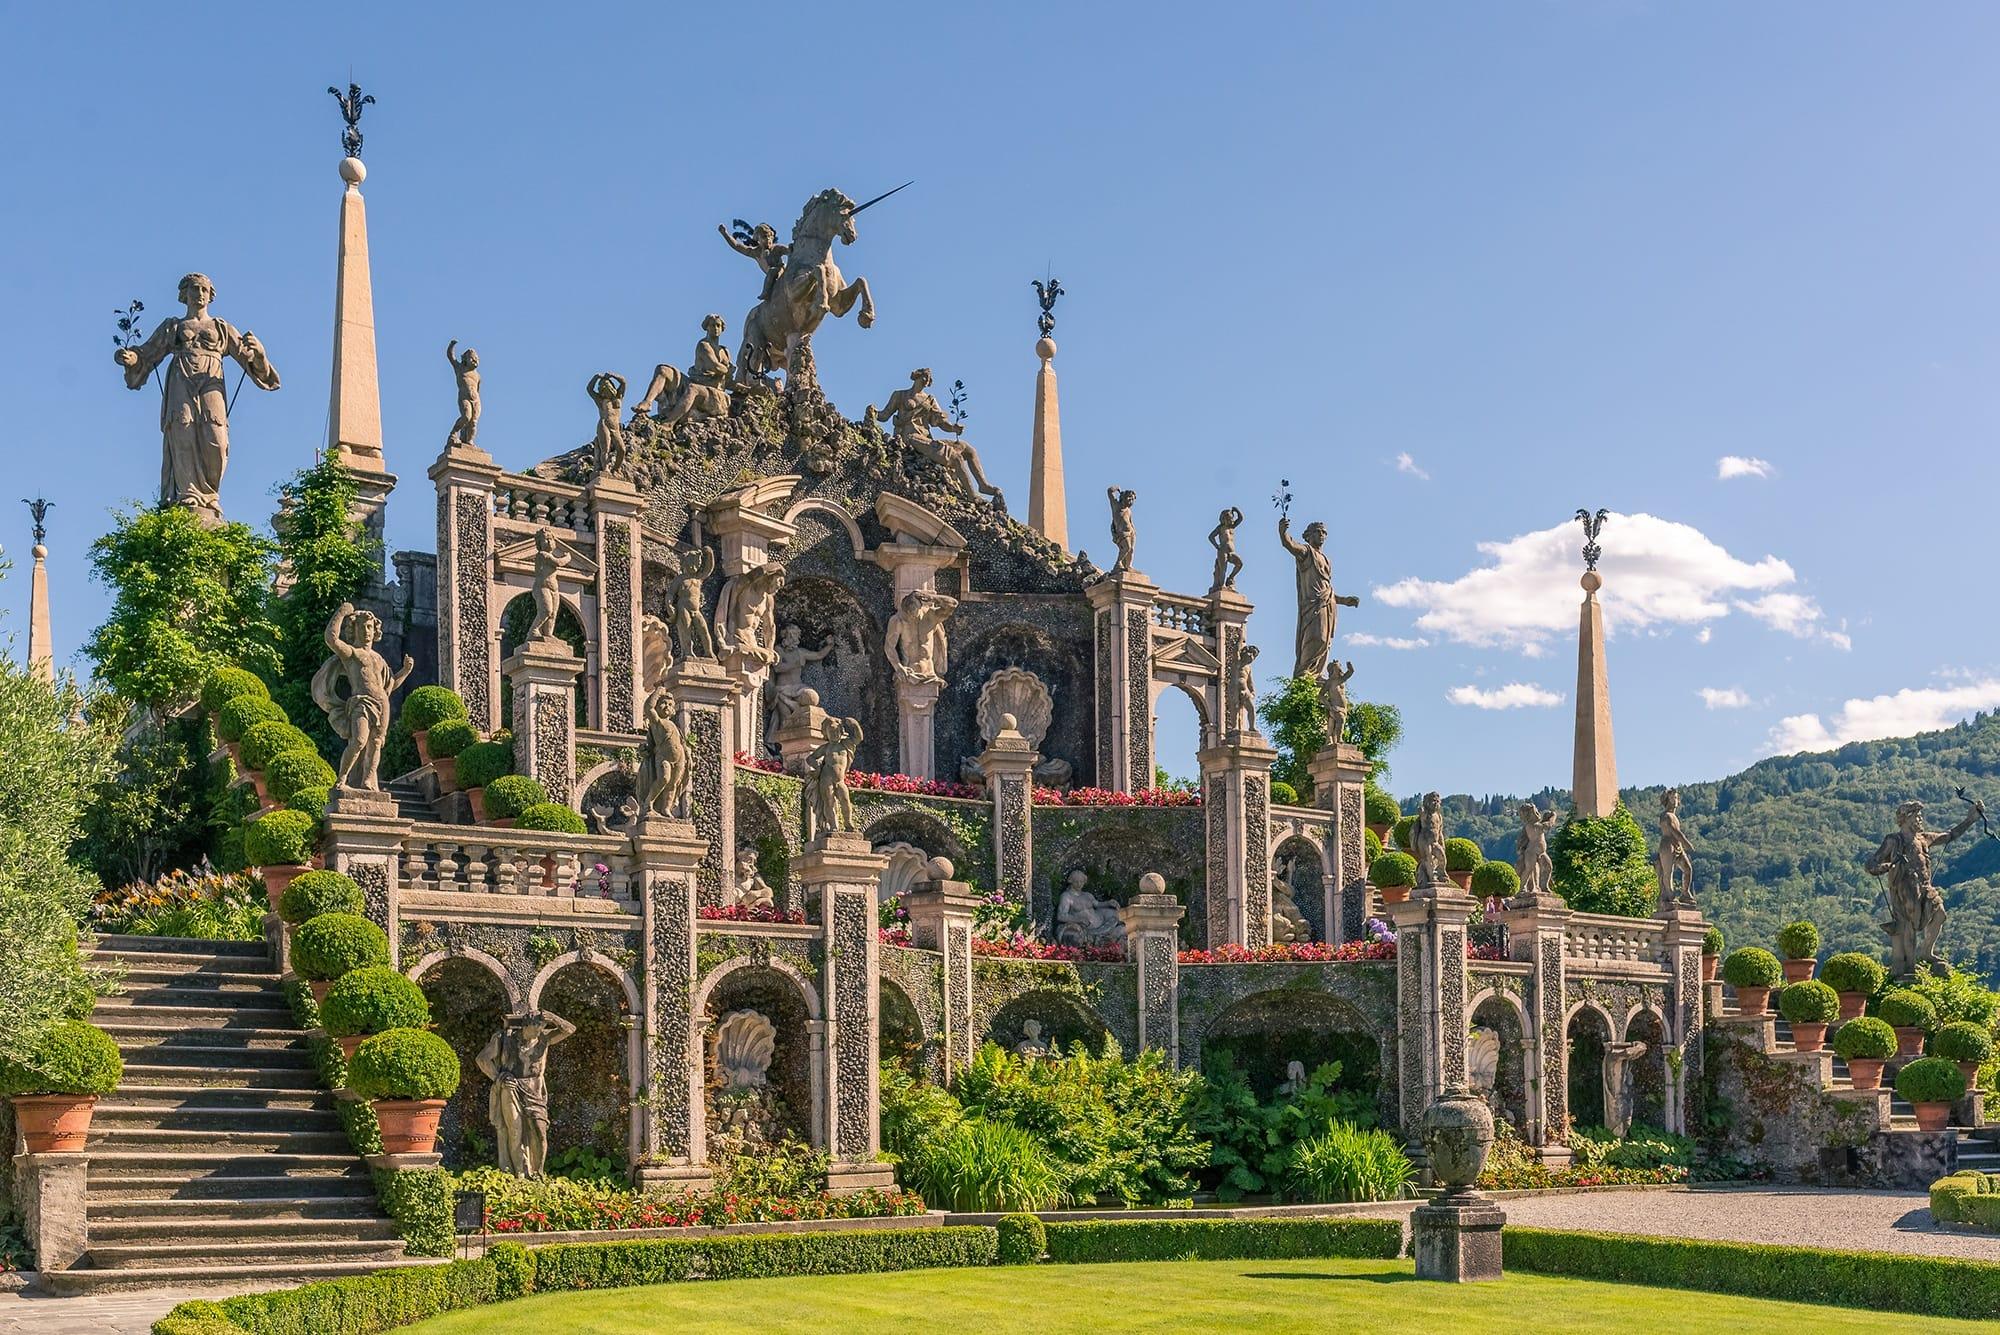 Stone theatre in the gardens of Isola Bella